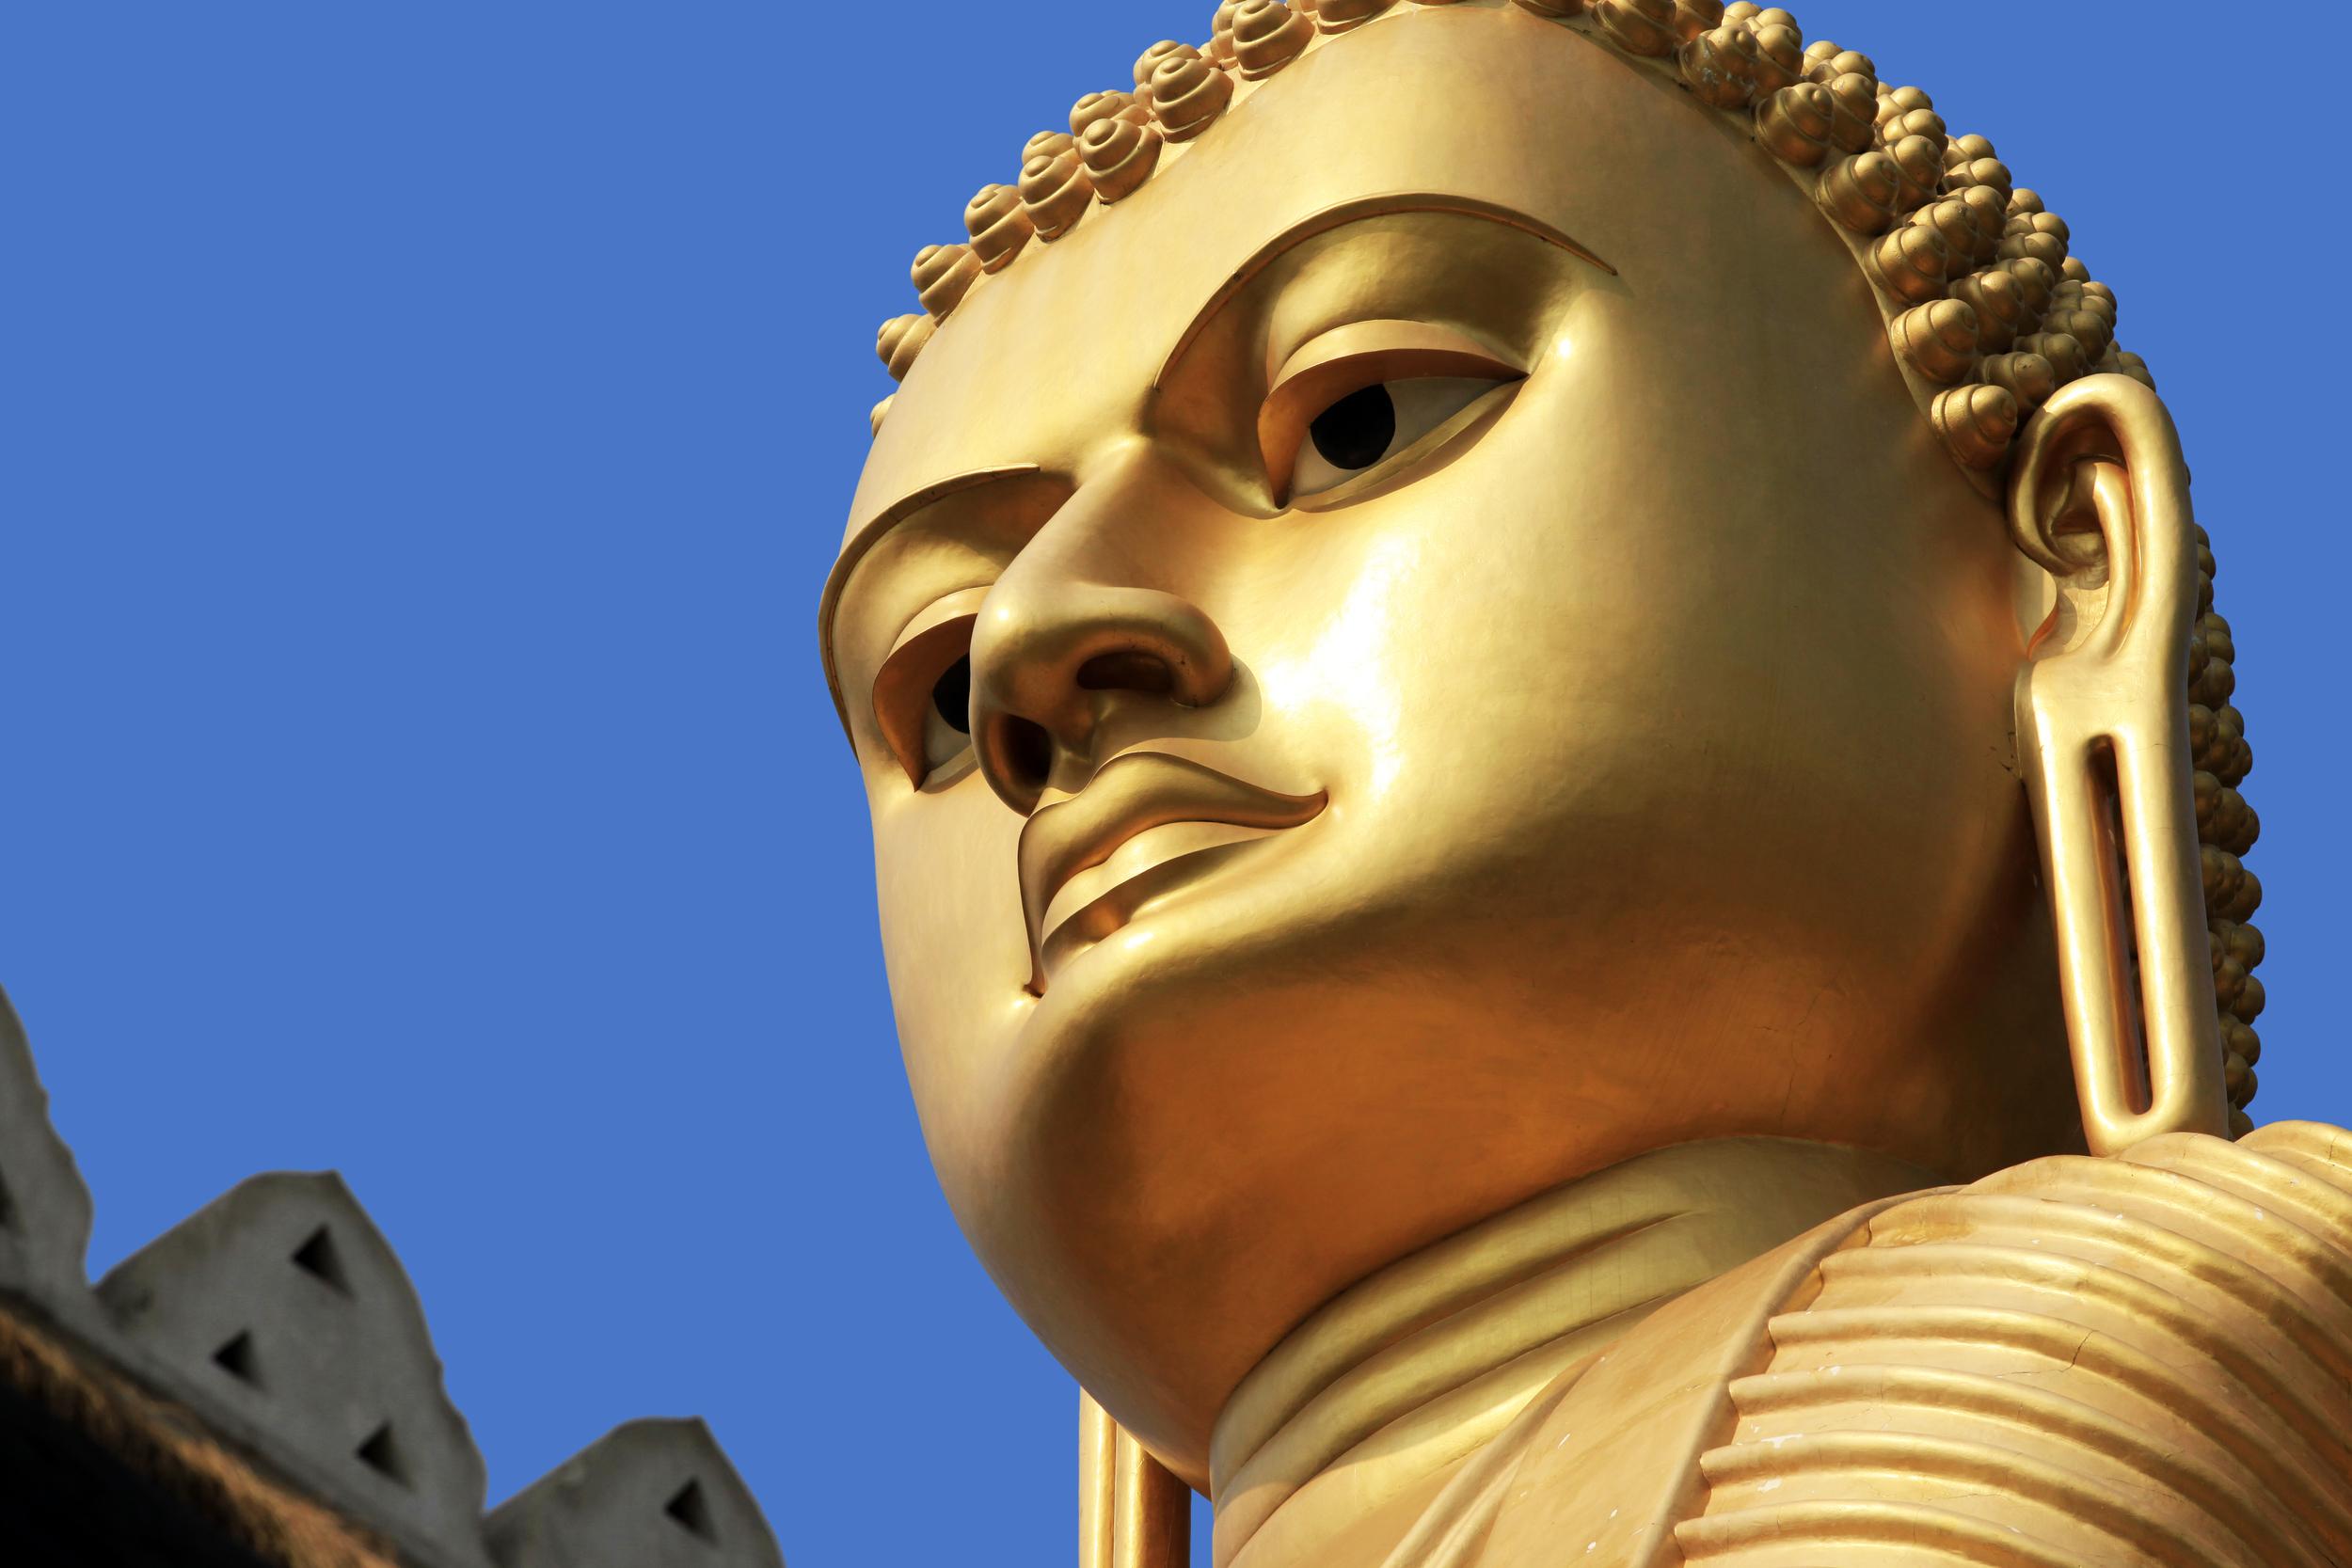 invite-to-paradise-sri-lanka-holiday-honeymoon-cultural-triangle-dambulla-cave-temple-golden-buddha-2.jpg